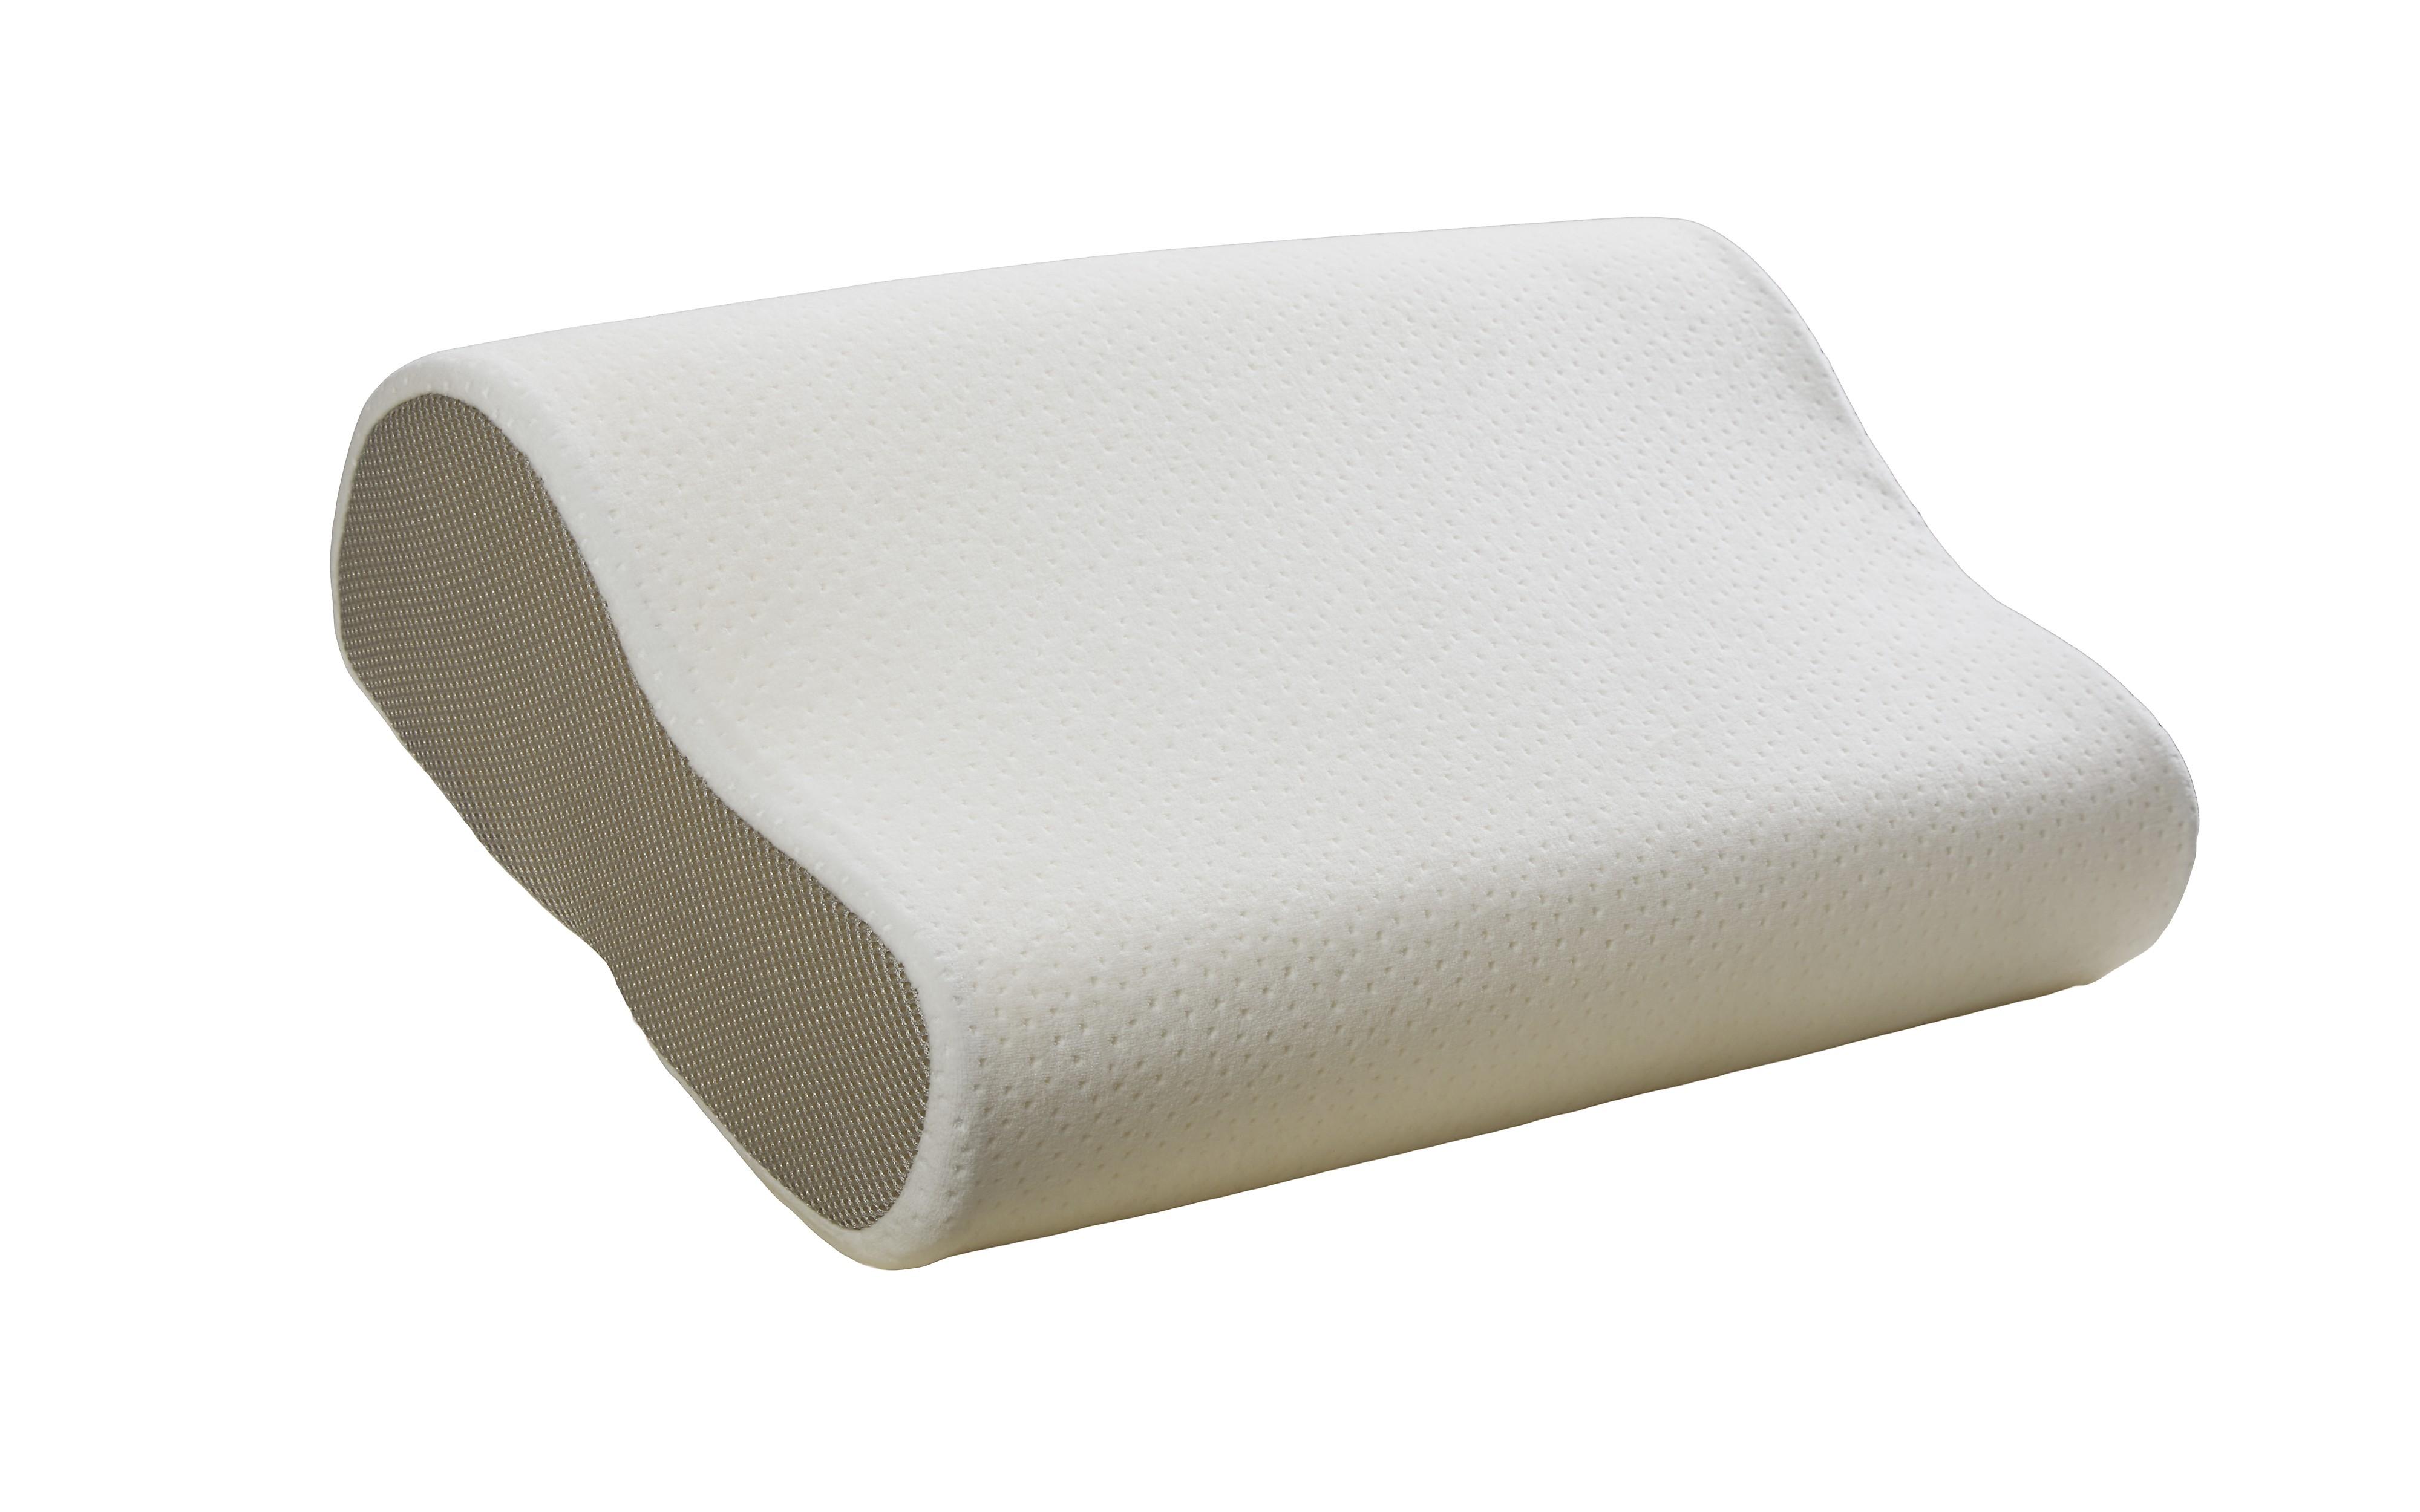 oreiller bultex ergonomique Oreiller Ergonomique Bultex   Liteir, Linge de lit oreiller bultex ergonomique